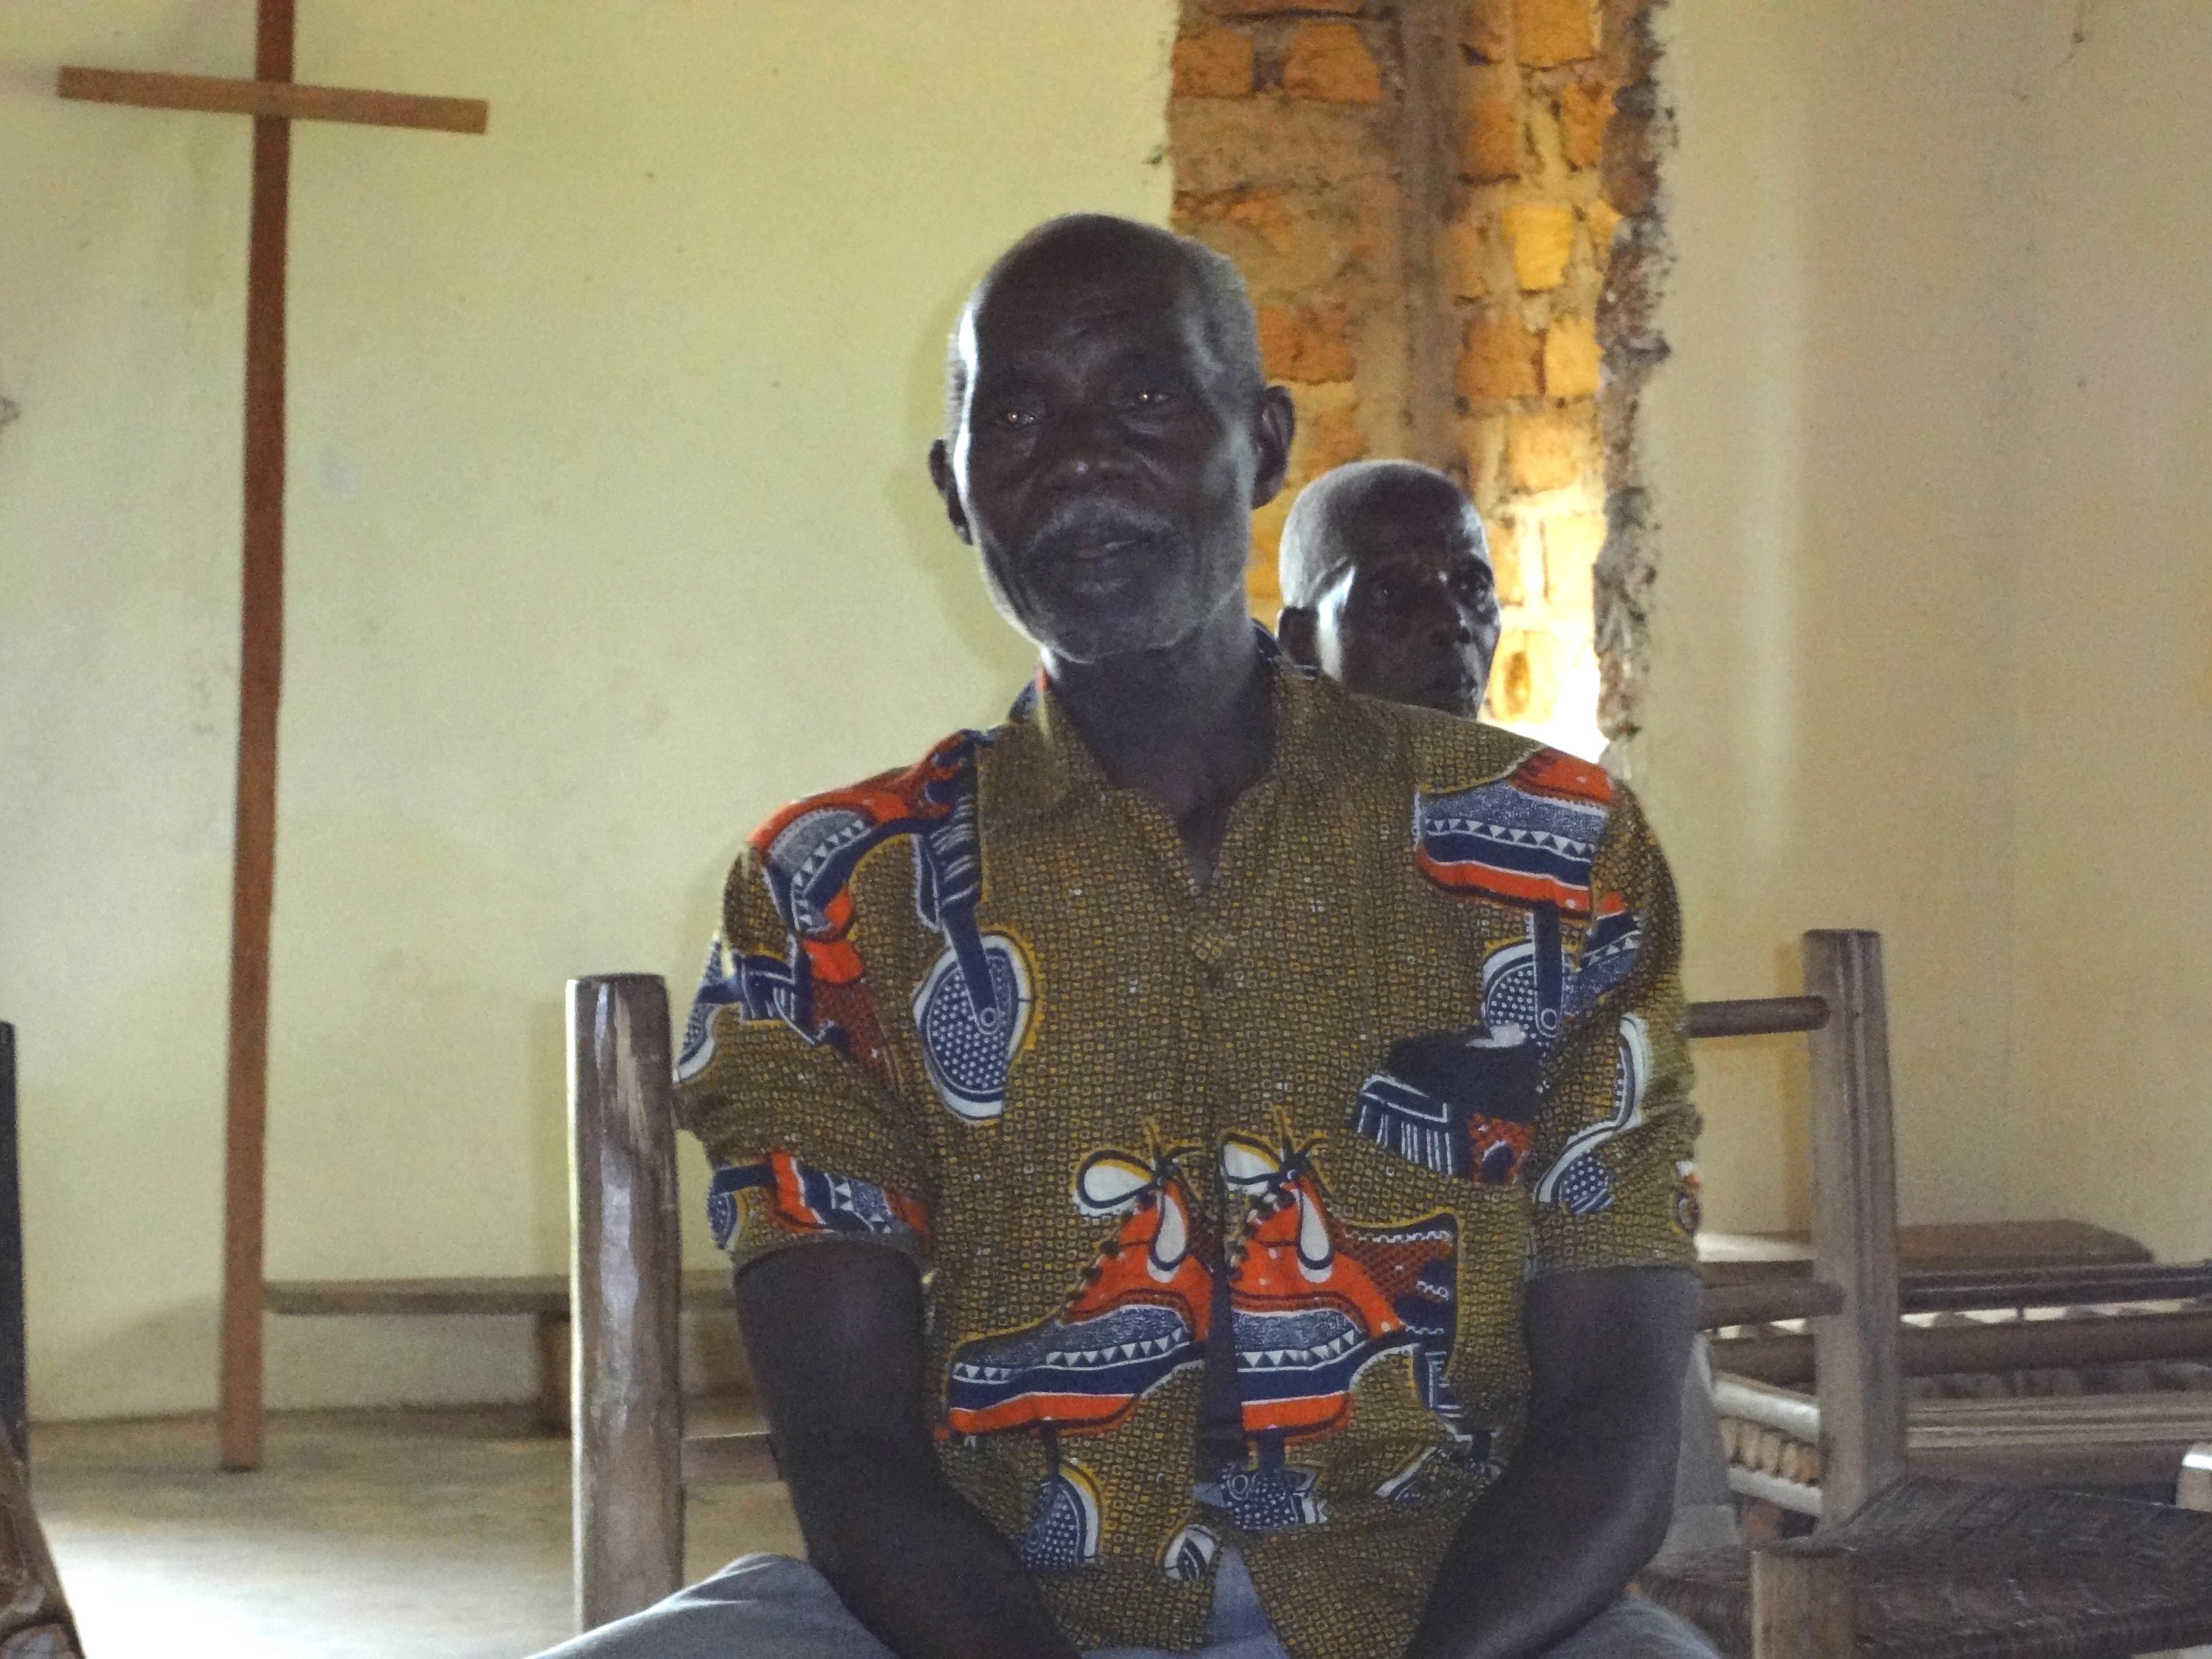 The Rev. William Joseph. Photo courtesy of Central Conference Pensions.